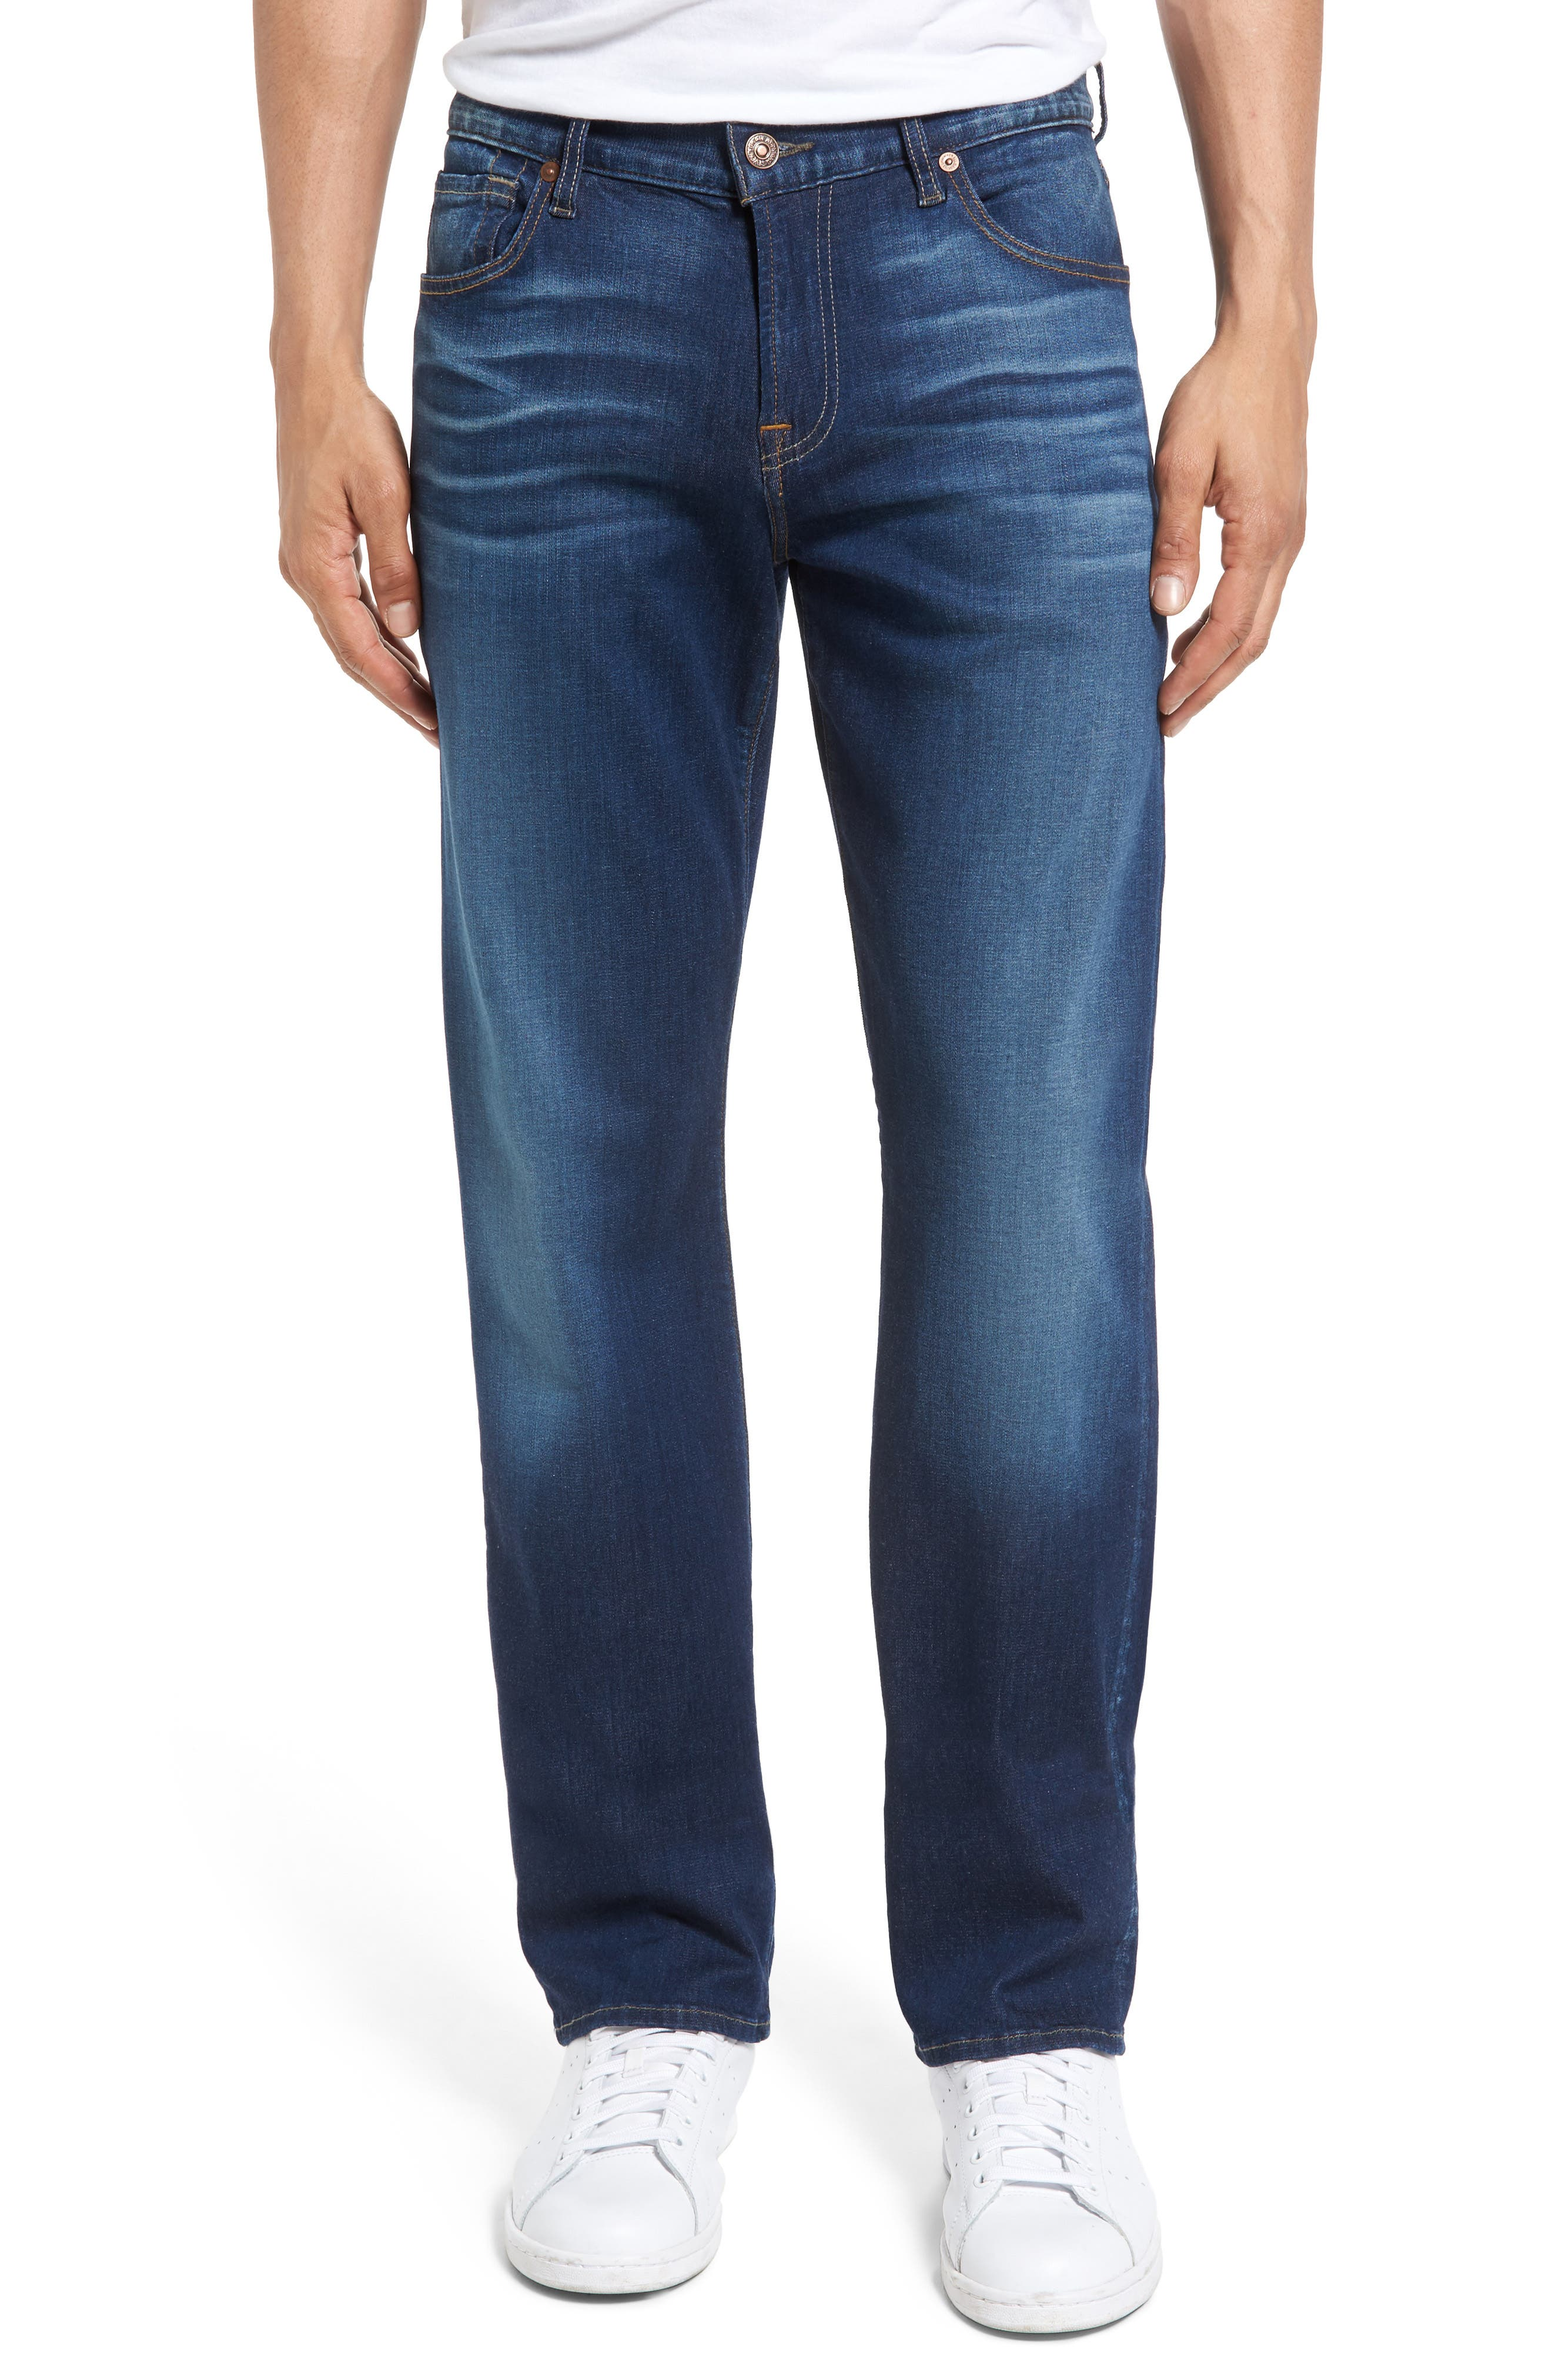 Slimmy Slim Fit Jeans,                         Main,                         color, 406